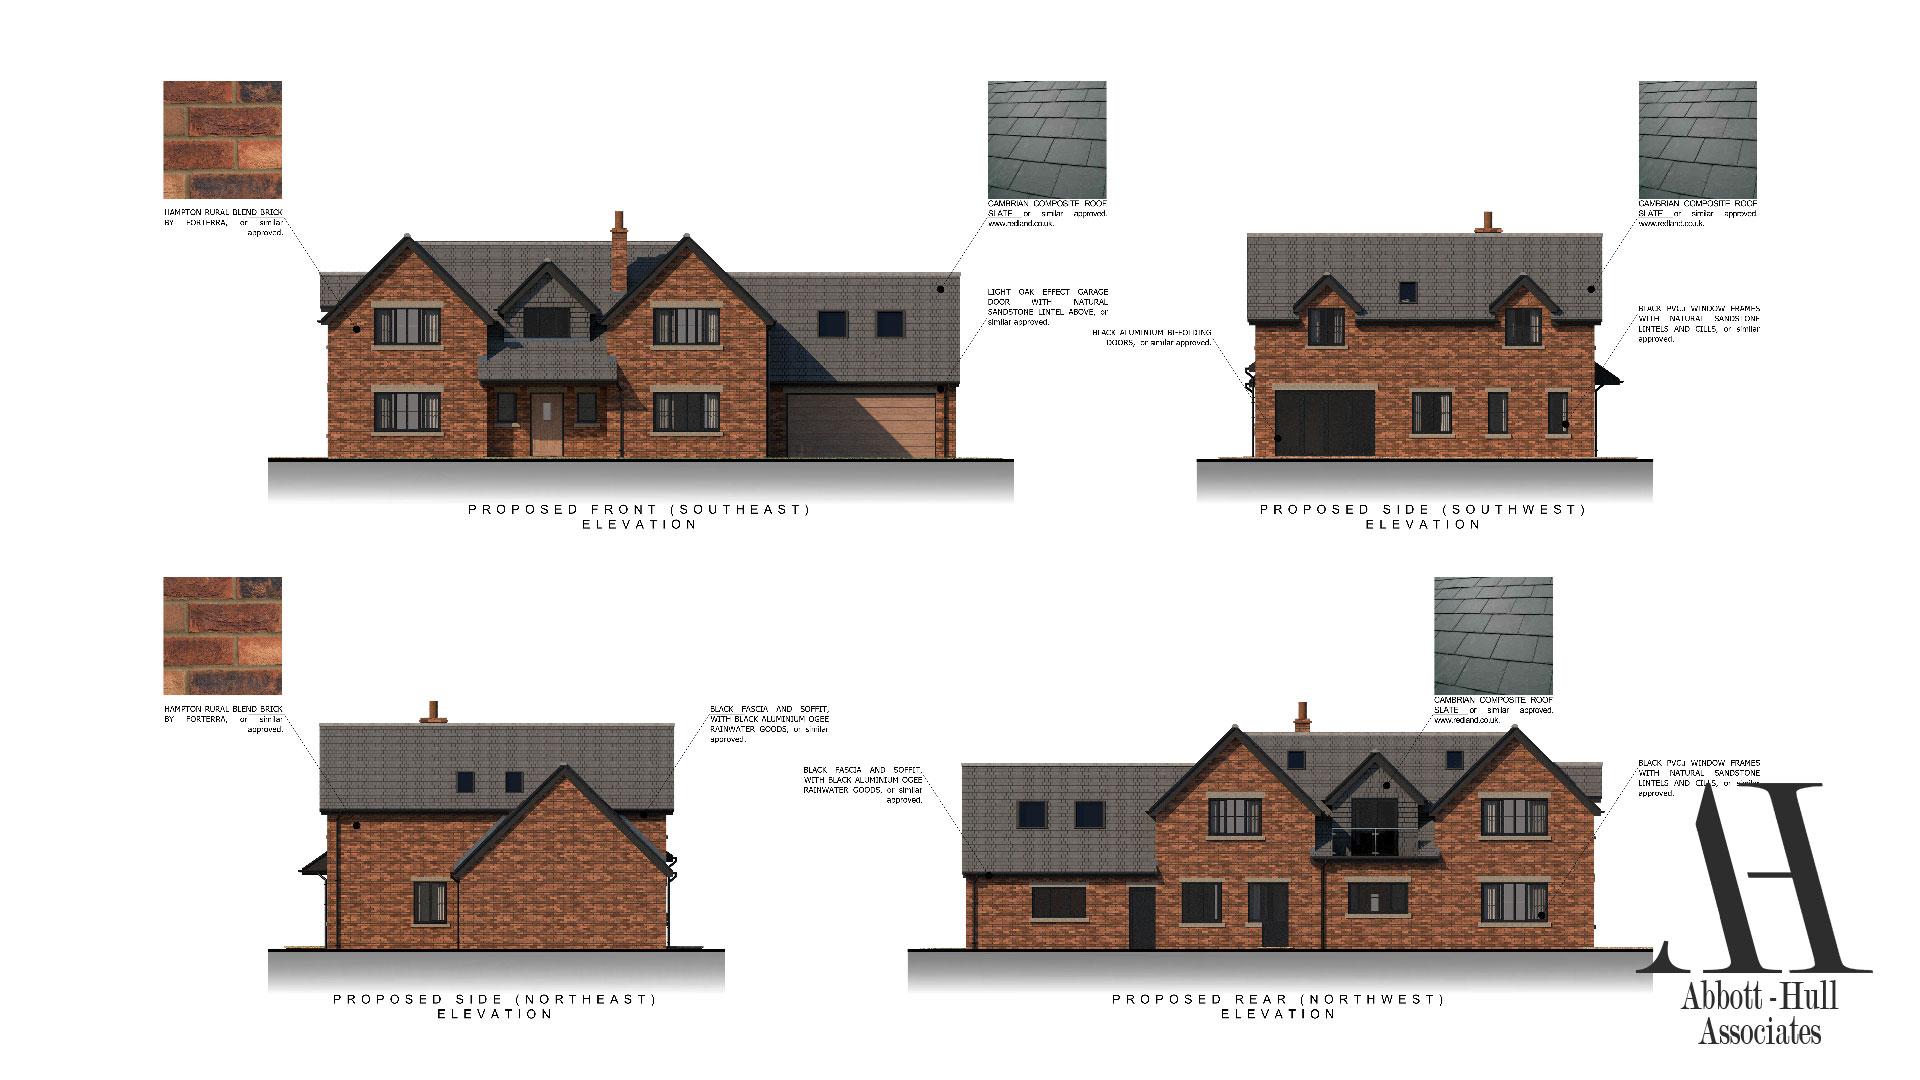 New Dwelling, Applegarth, Singleton - Proposed Elevations